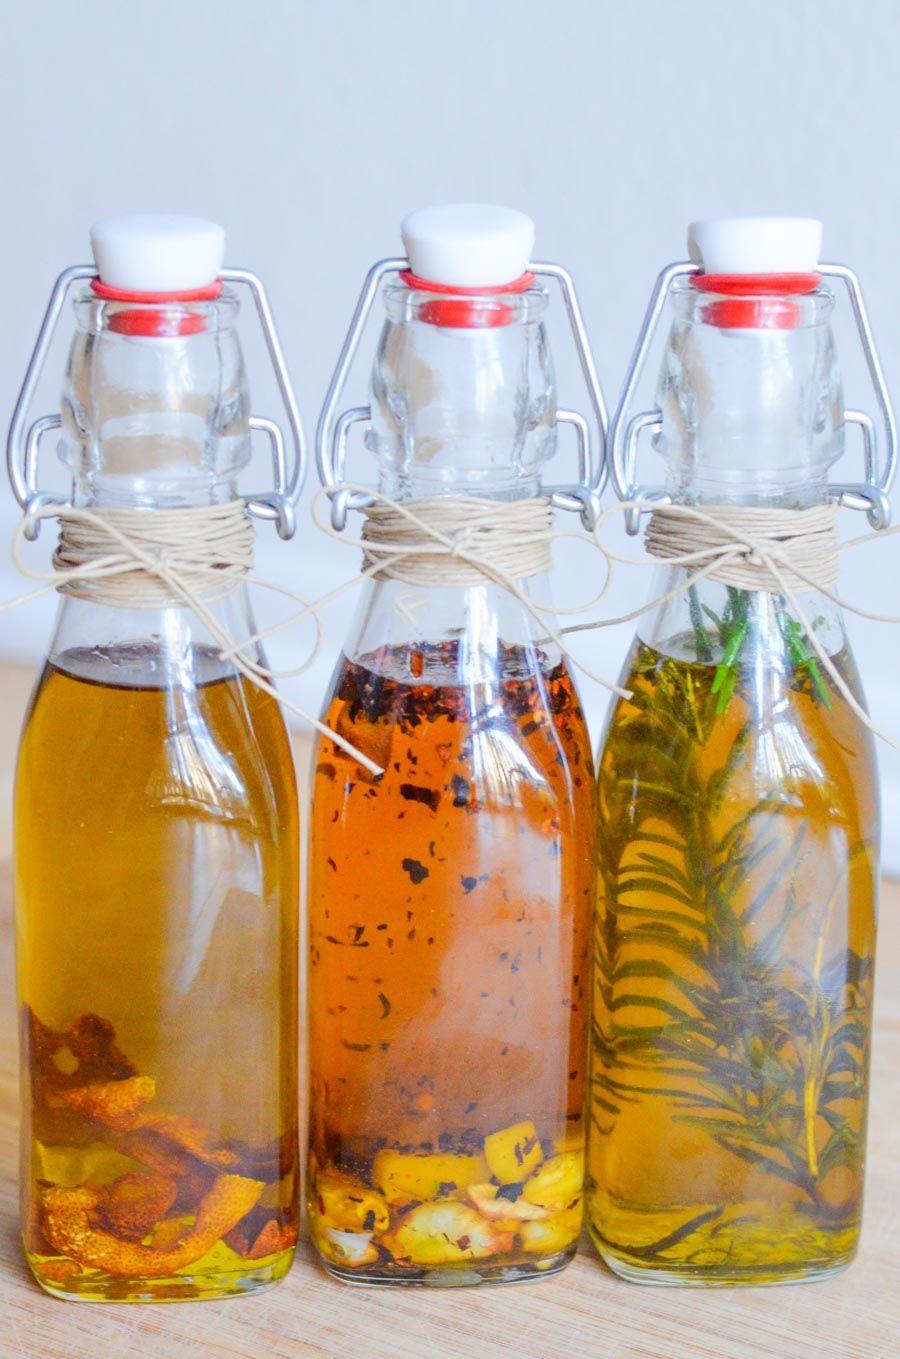 DIY Gift: Homemade Infused Olive Oils #oliveoils